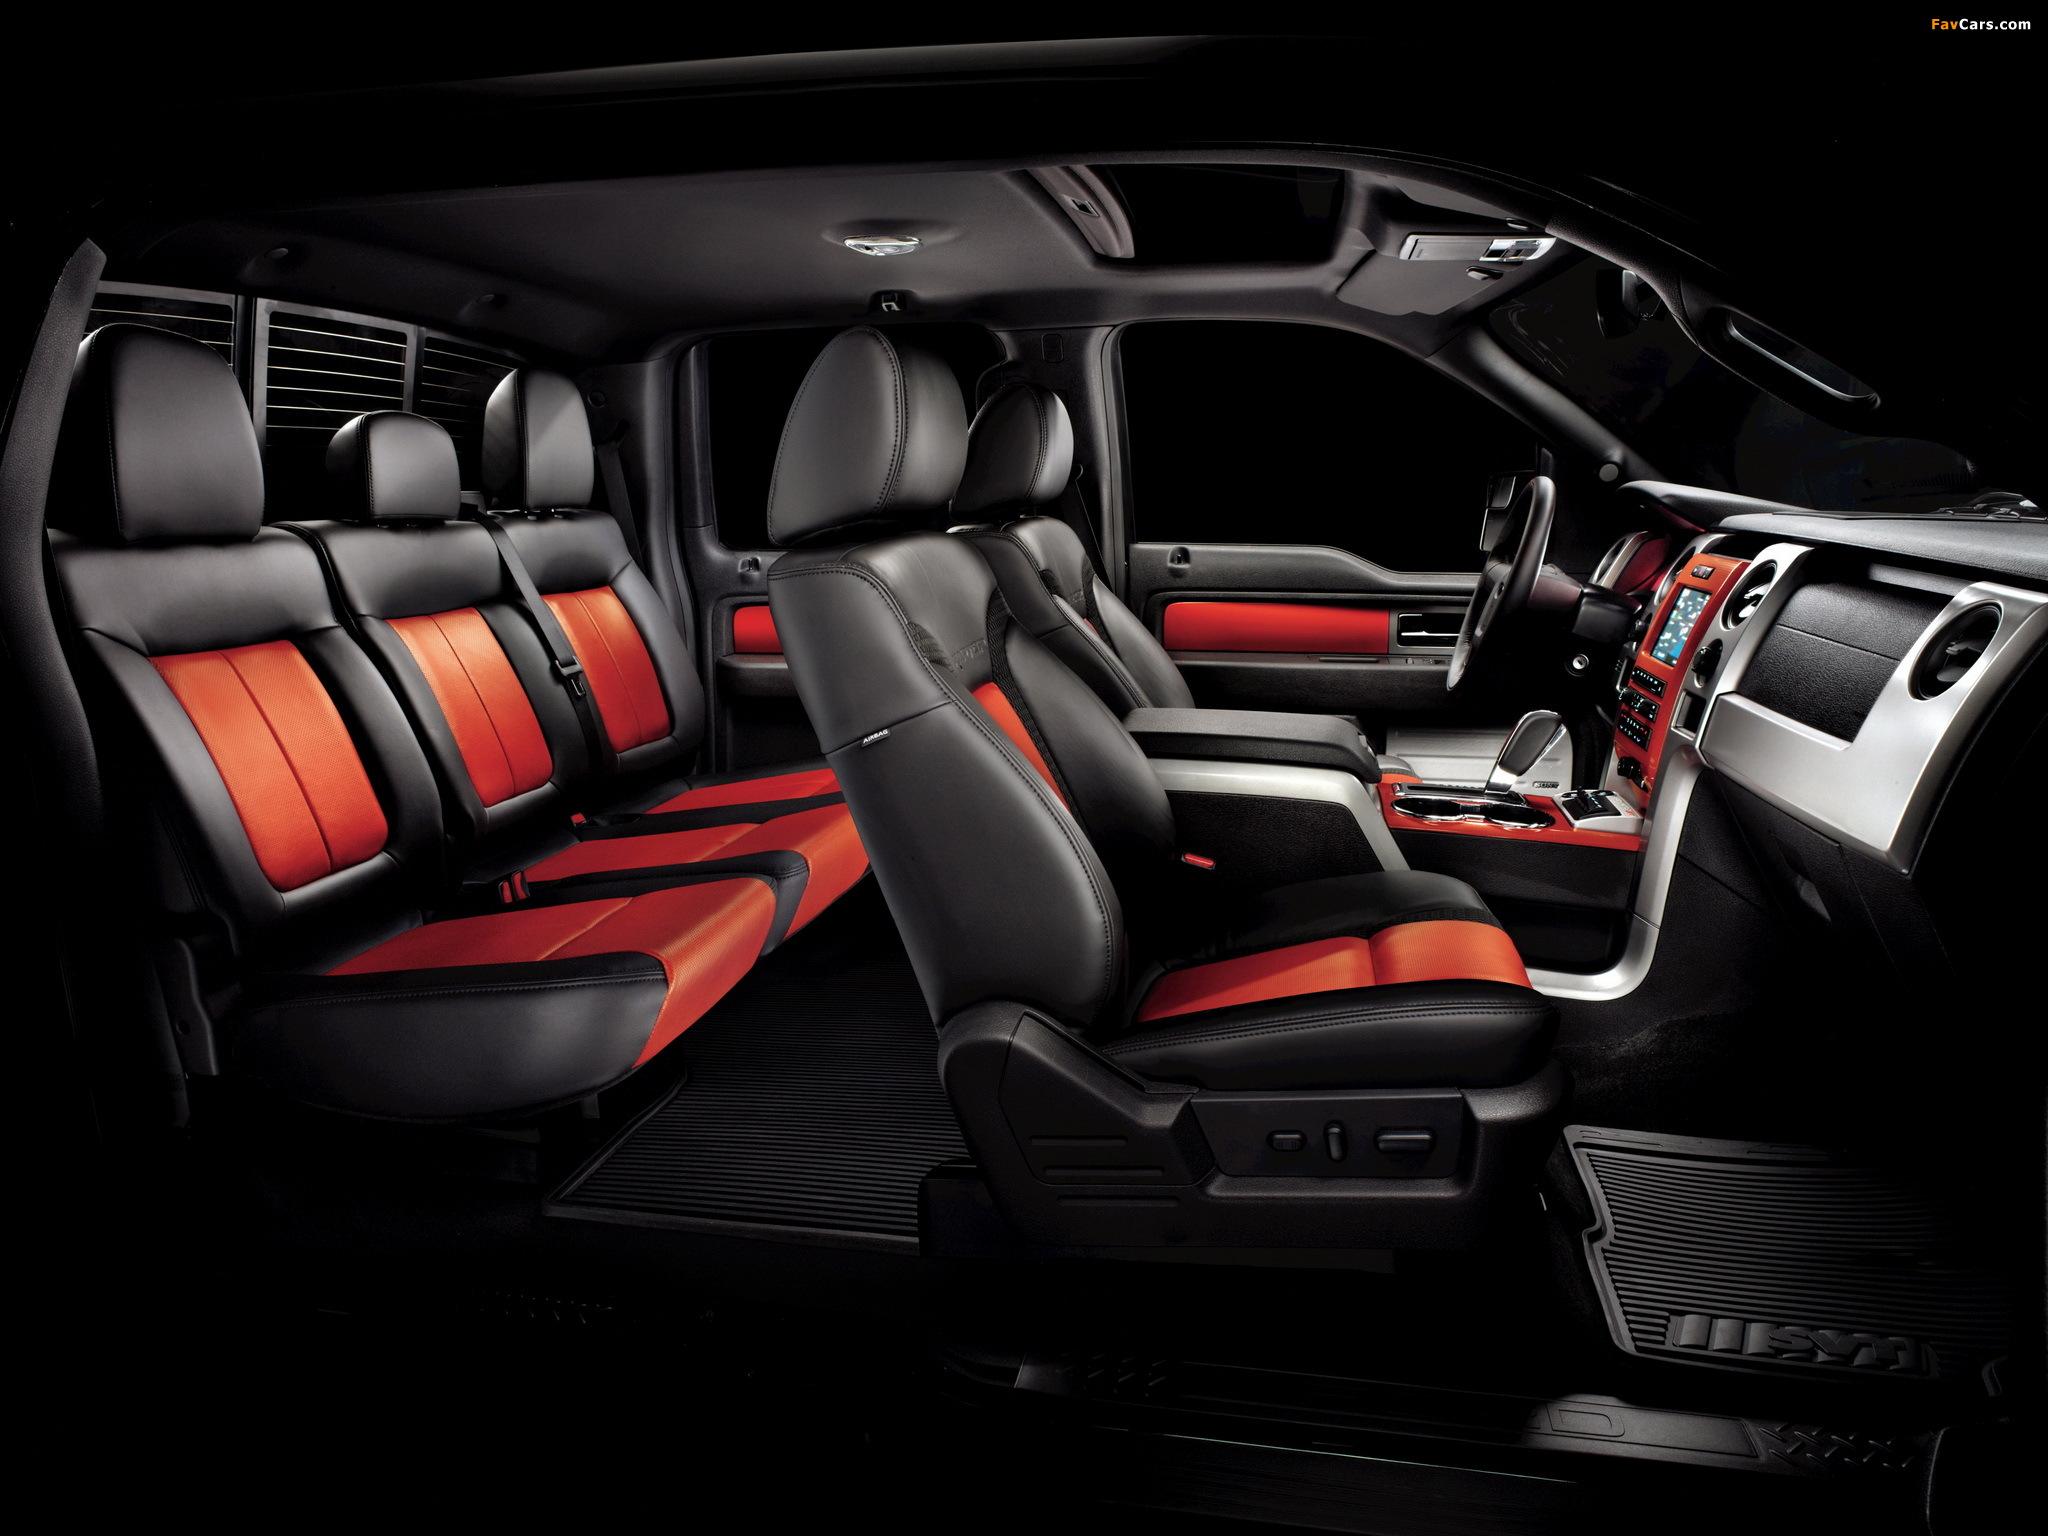 Ford Raptor - автомобили, запчасти, тюнинг - доставка по ...